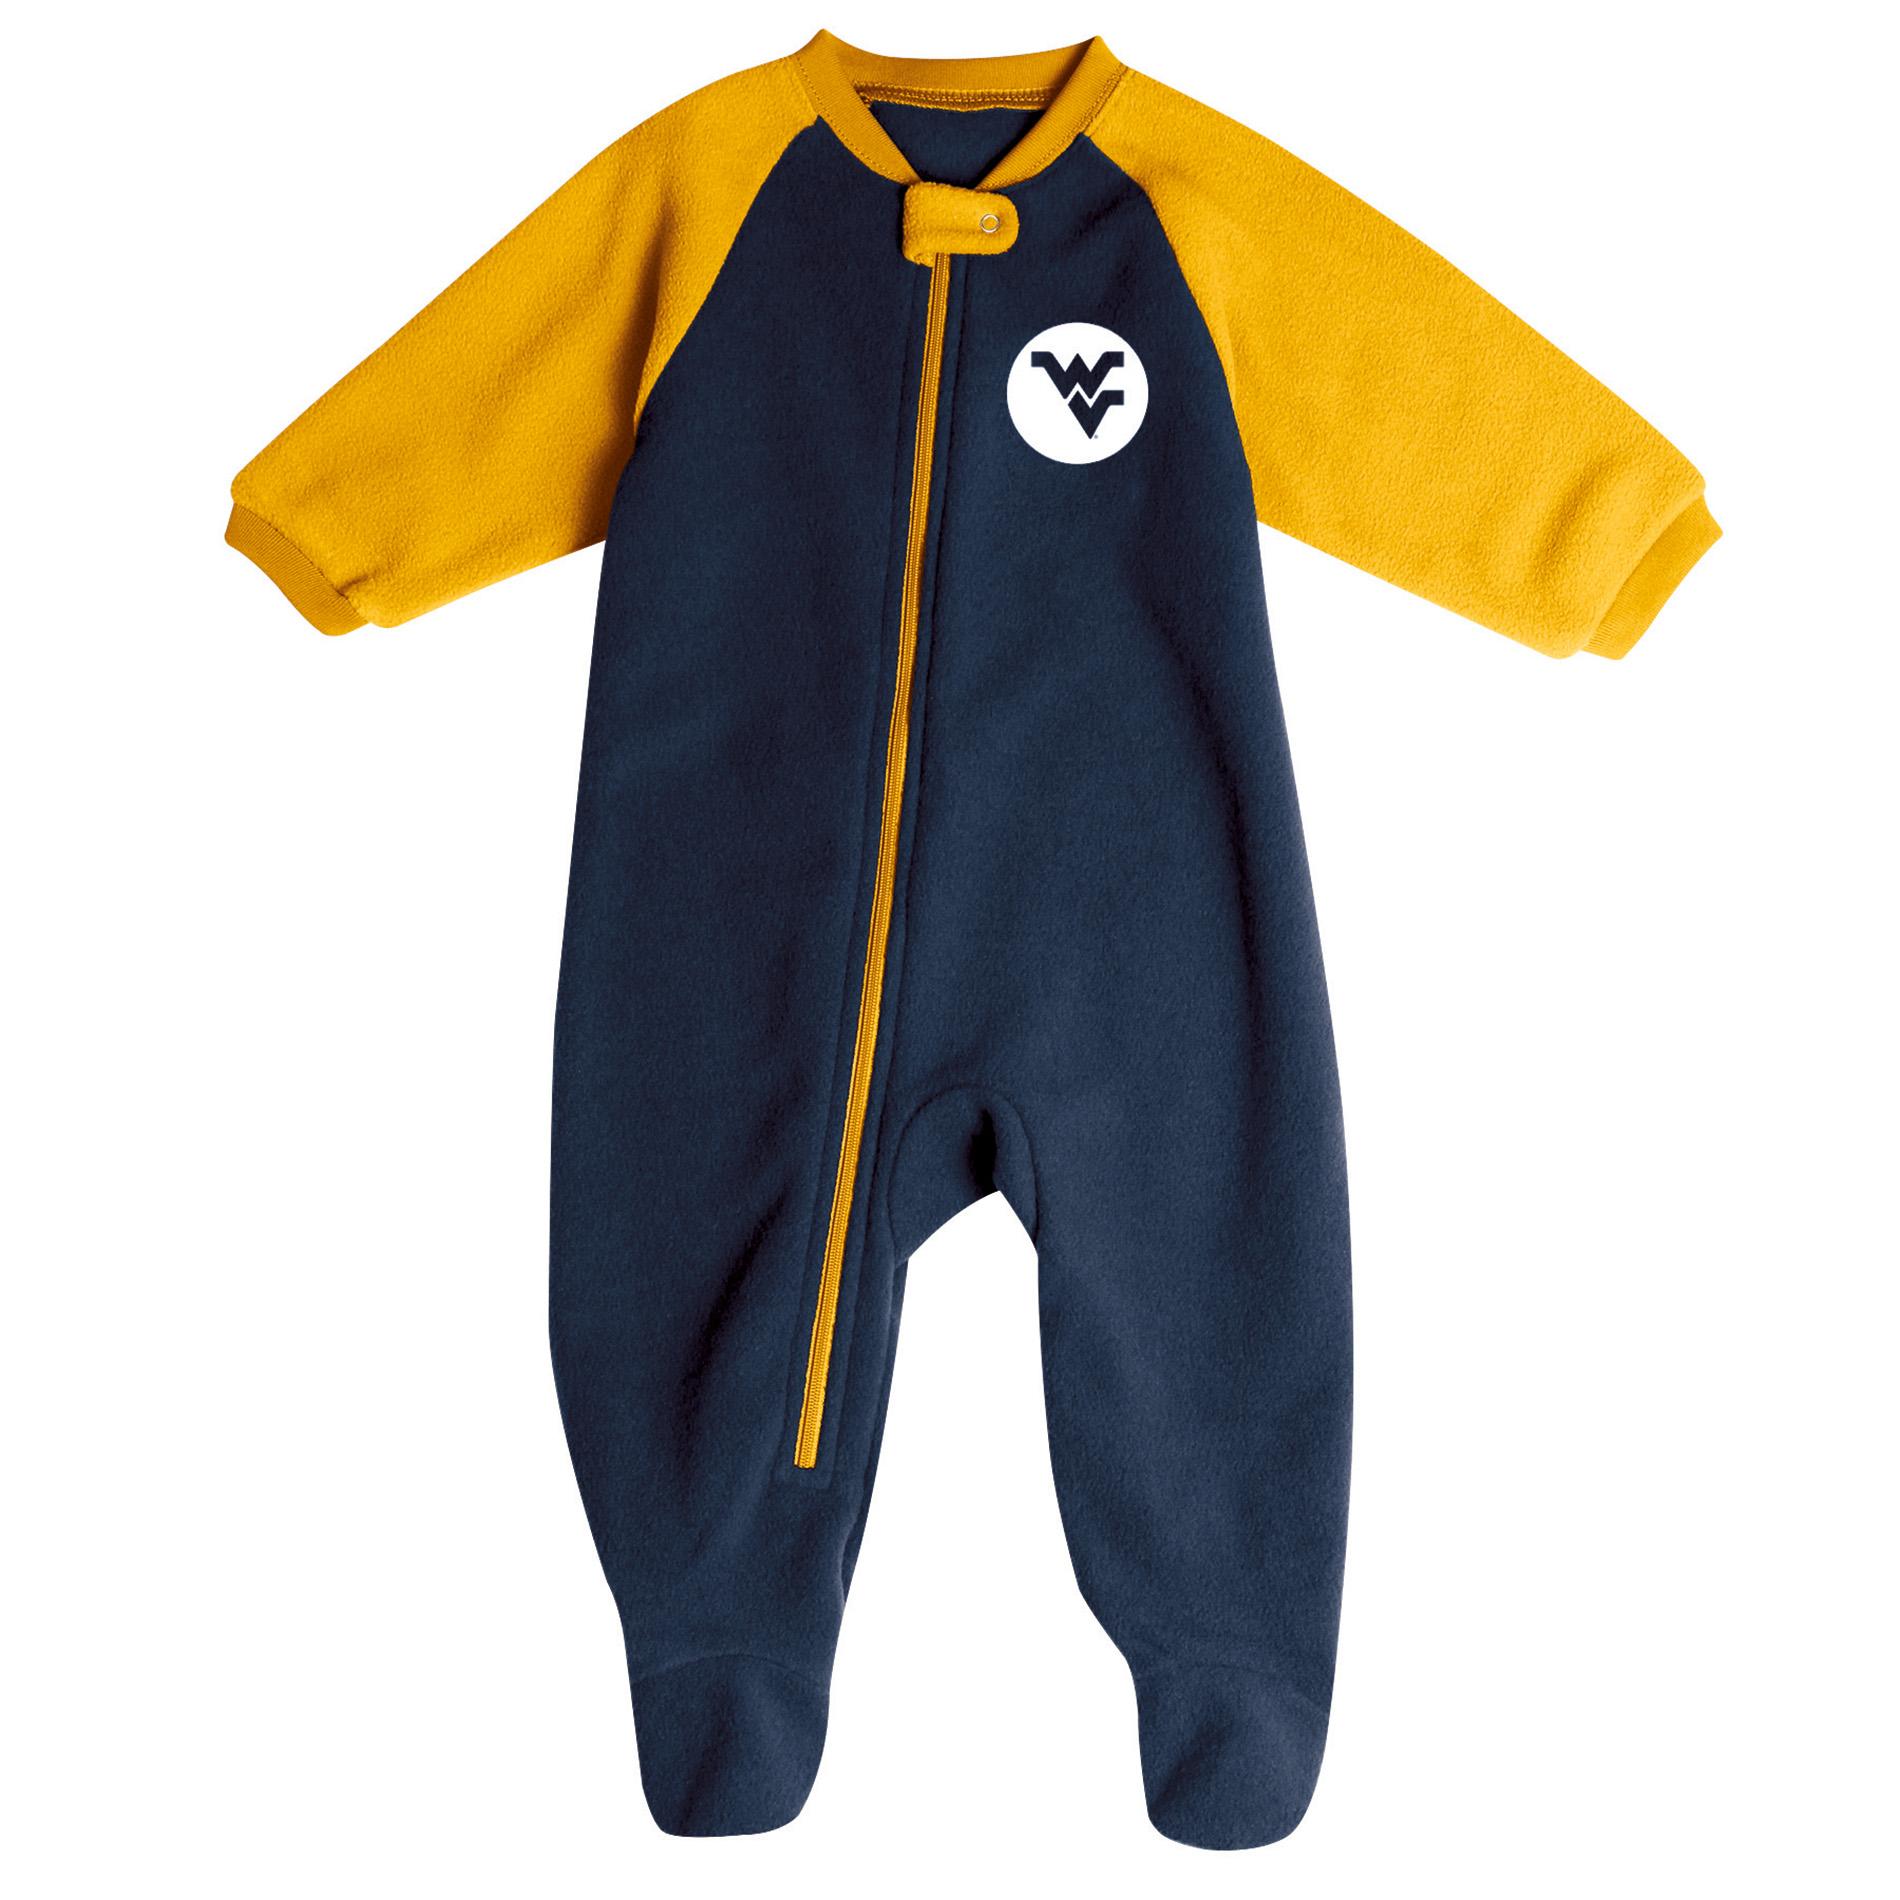 NCAA Infant Boys' Logo Blanket Sleeper - West Virginia Mountaineers, Size: 6-9 Months, Black im test